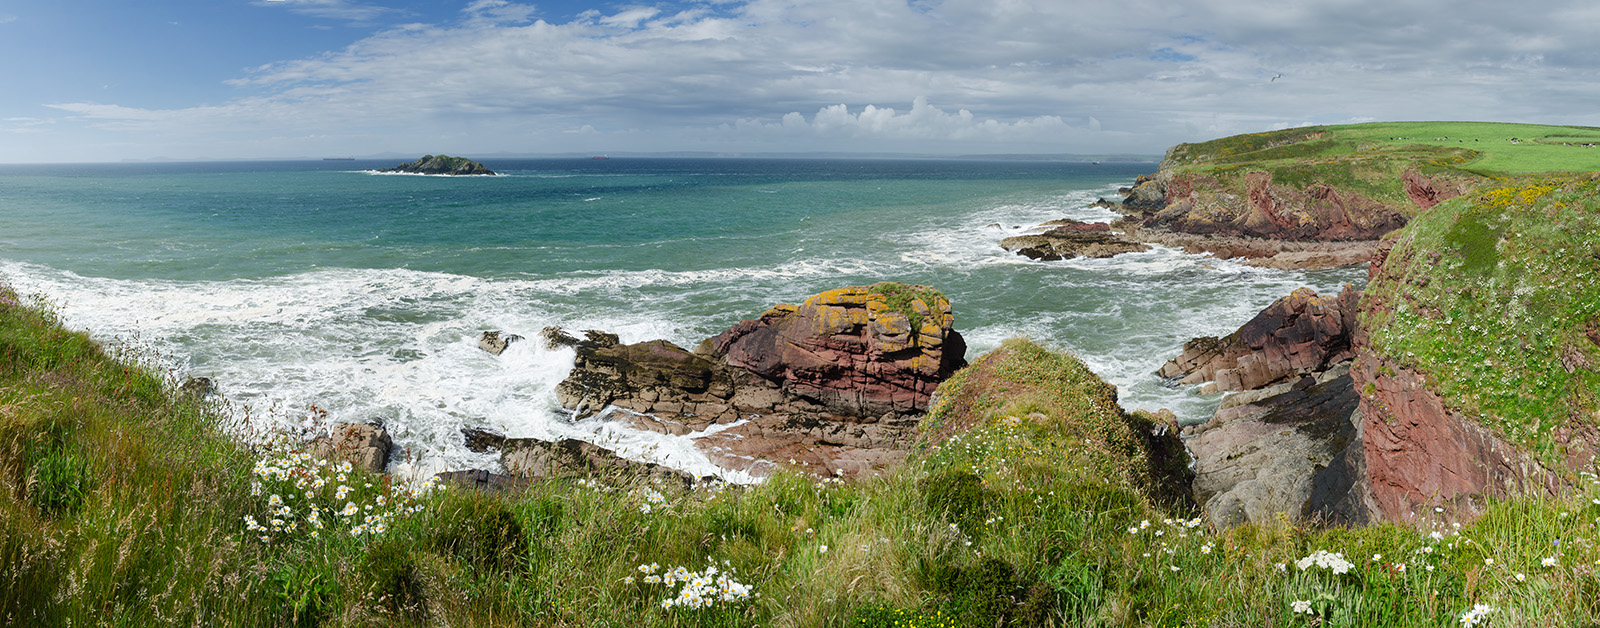 druidstone_haven_marloes-panorama7-2